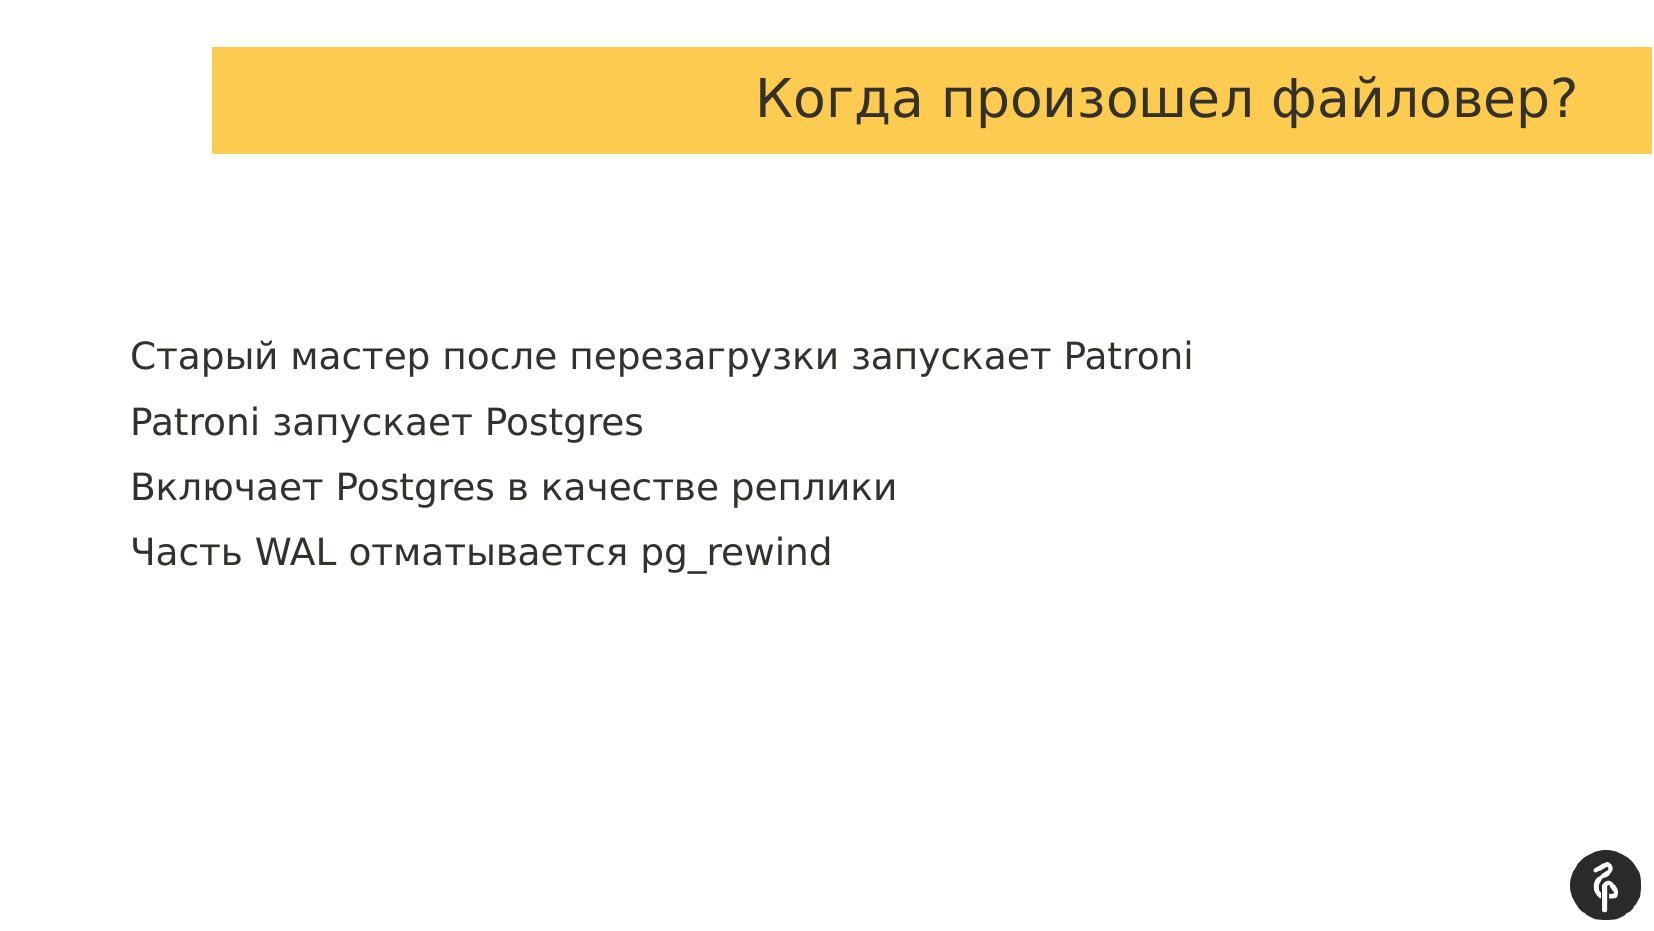 eomfrr-aeo3wg2_tuqzrejmrkyc.png